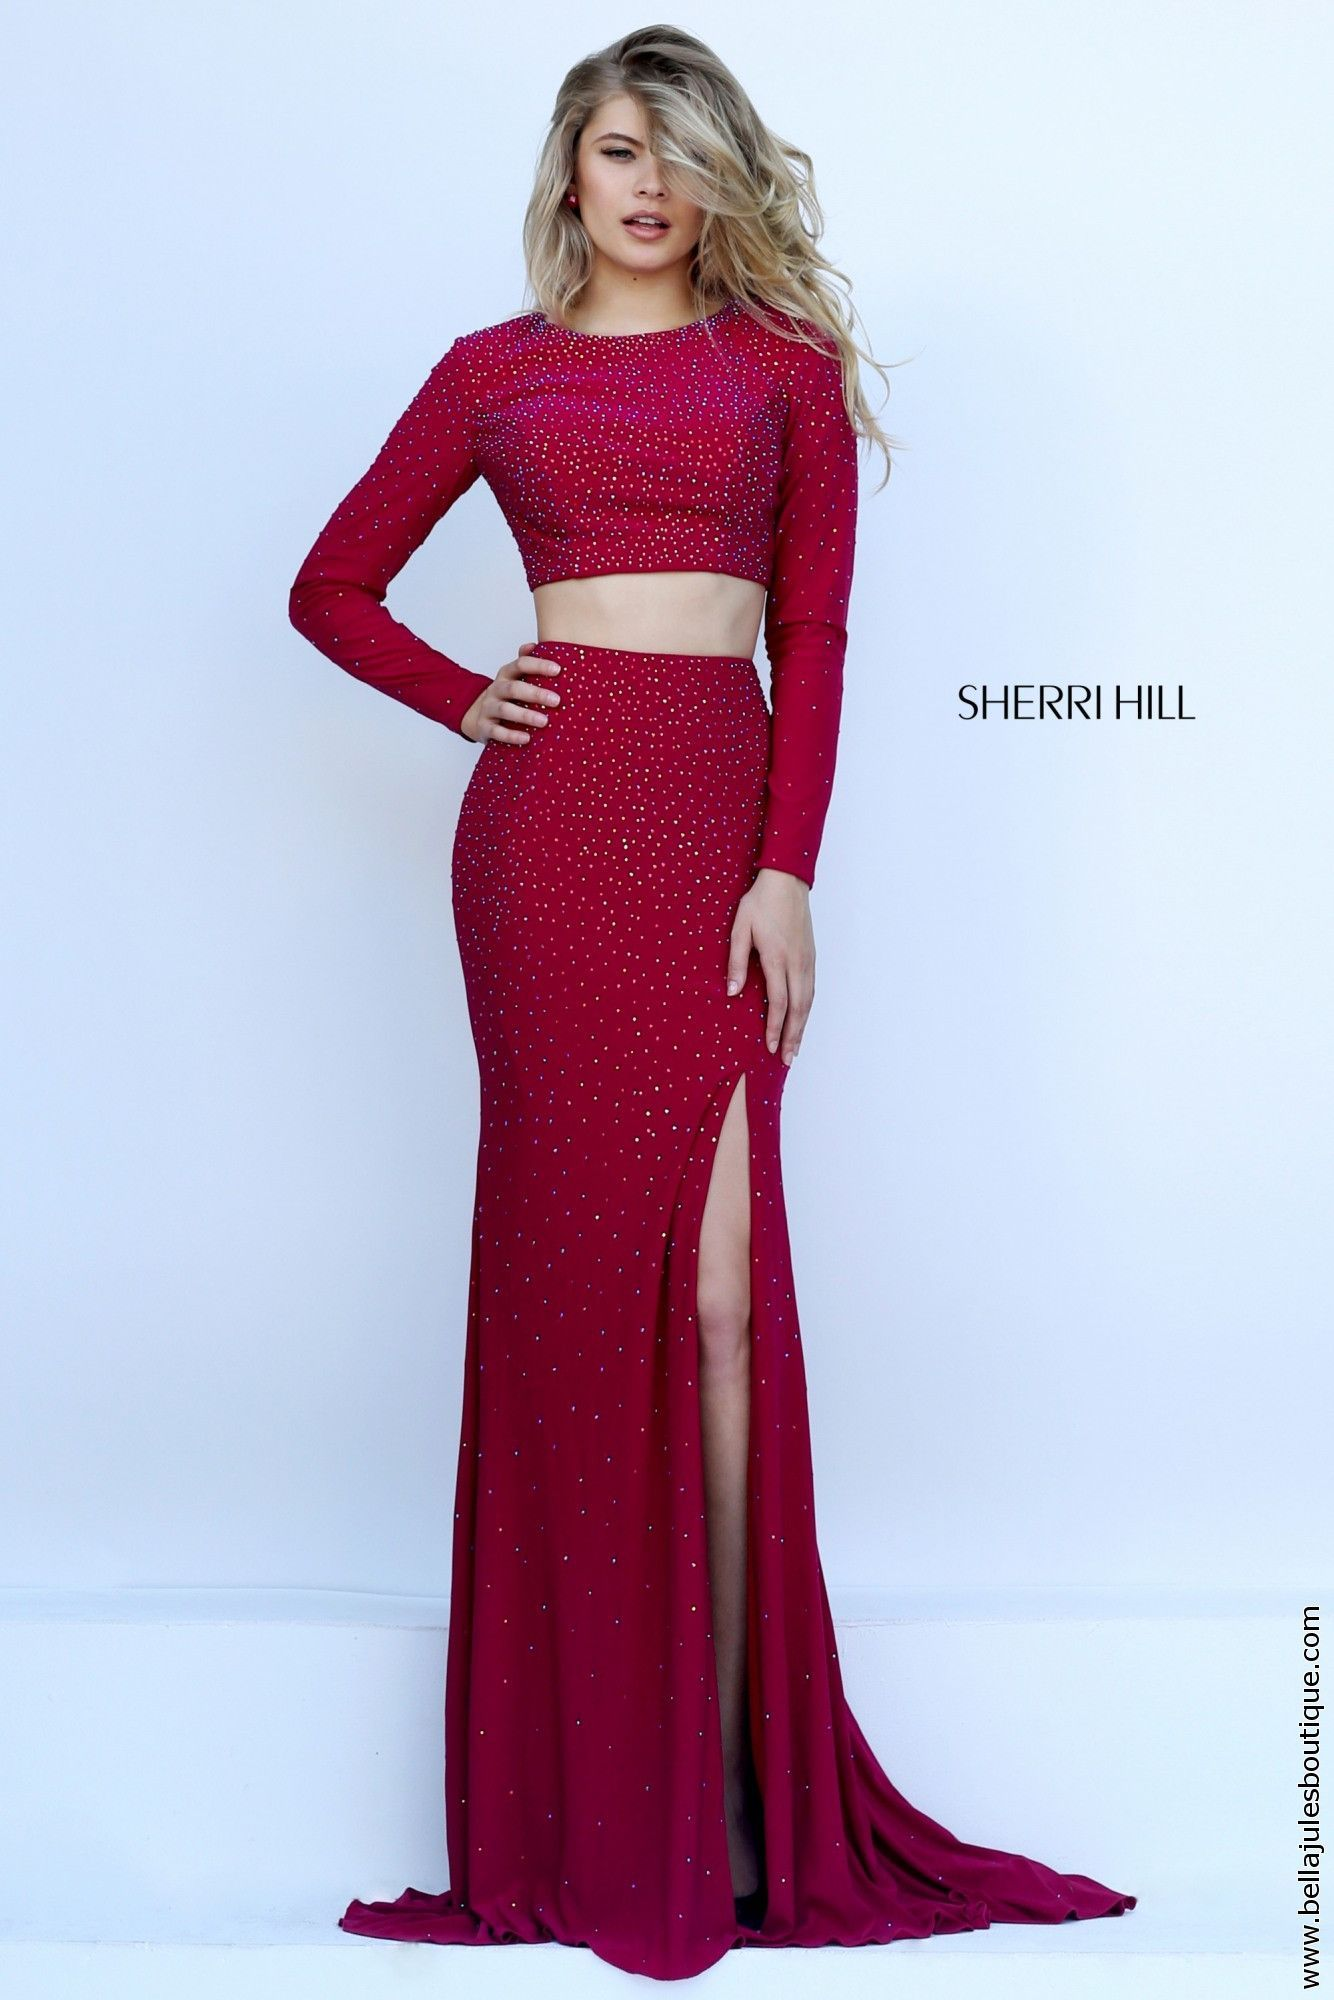 Sherri hill prom dress style prom pinterest sherri hill